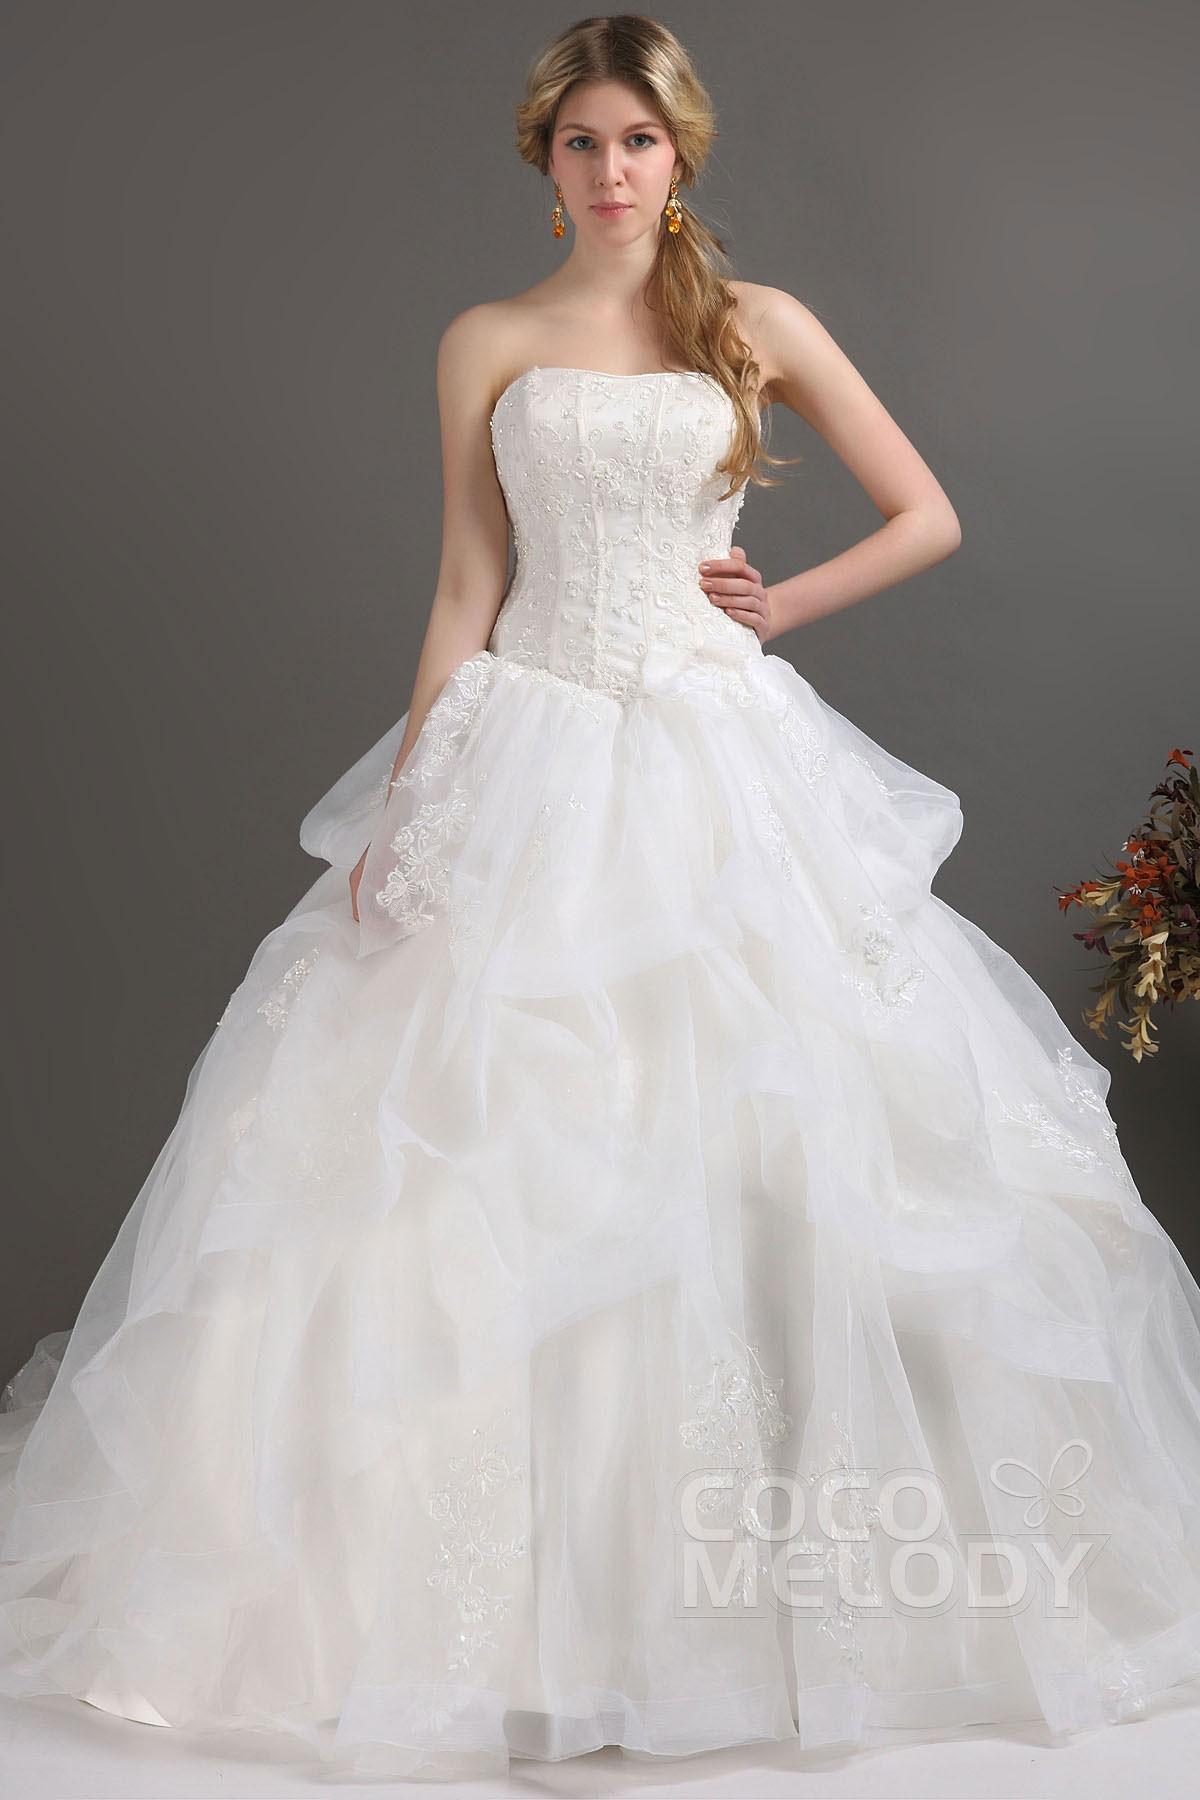 Cocomelody: Ball Gown Sweetheart Chapel Train Organza Wedding Dress ...